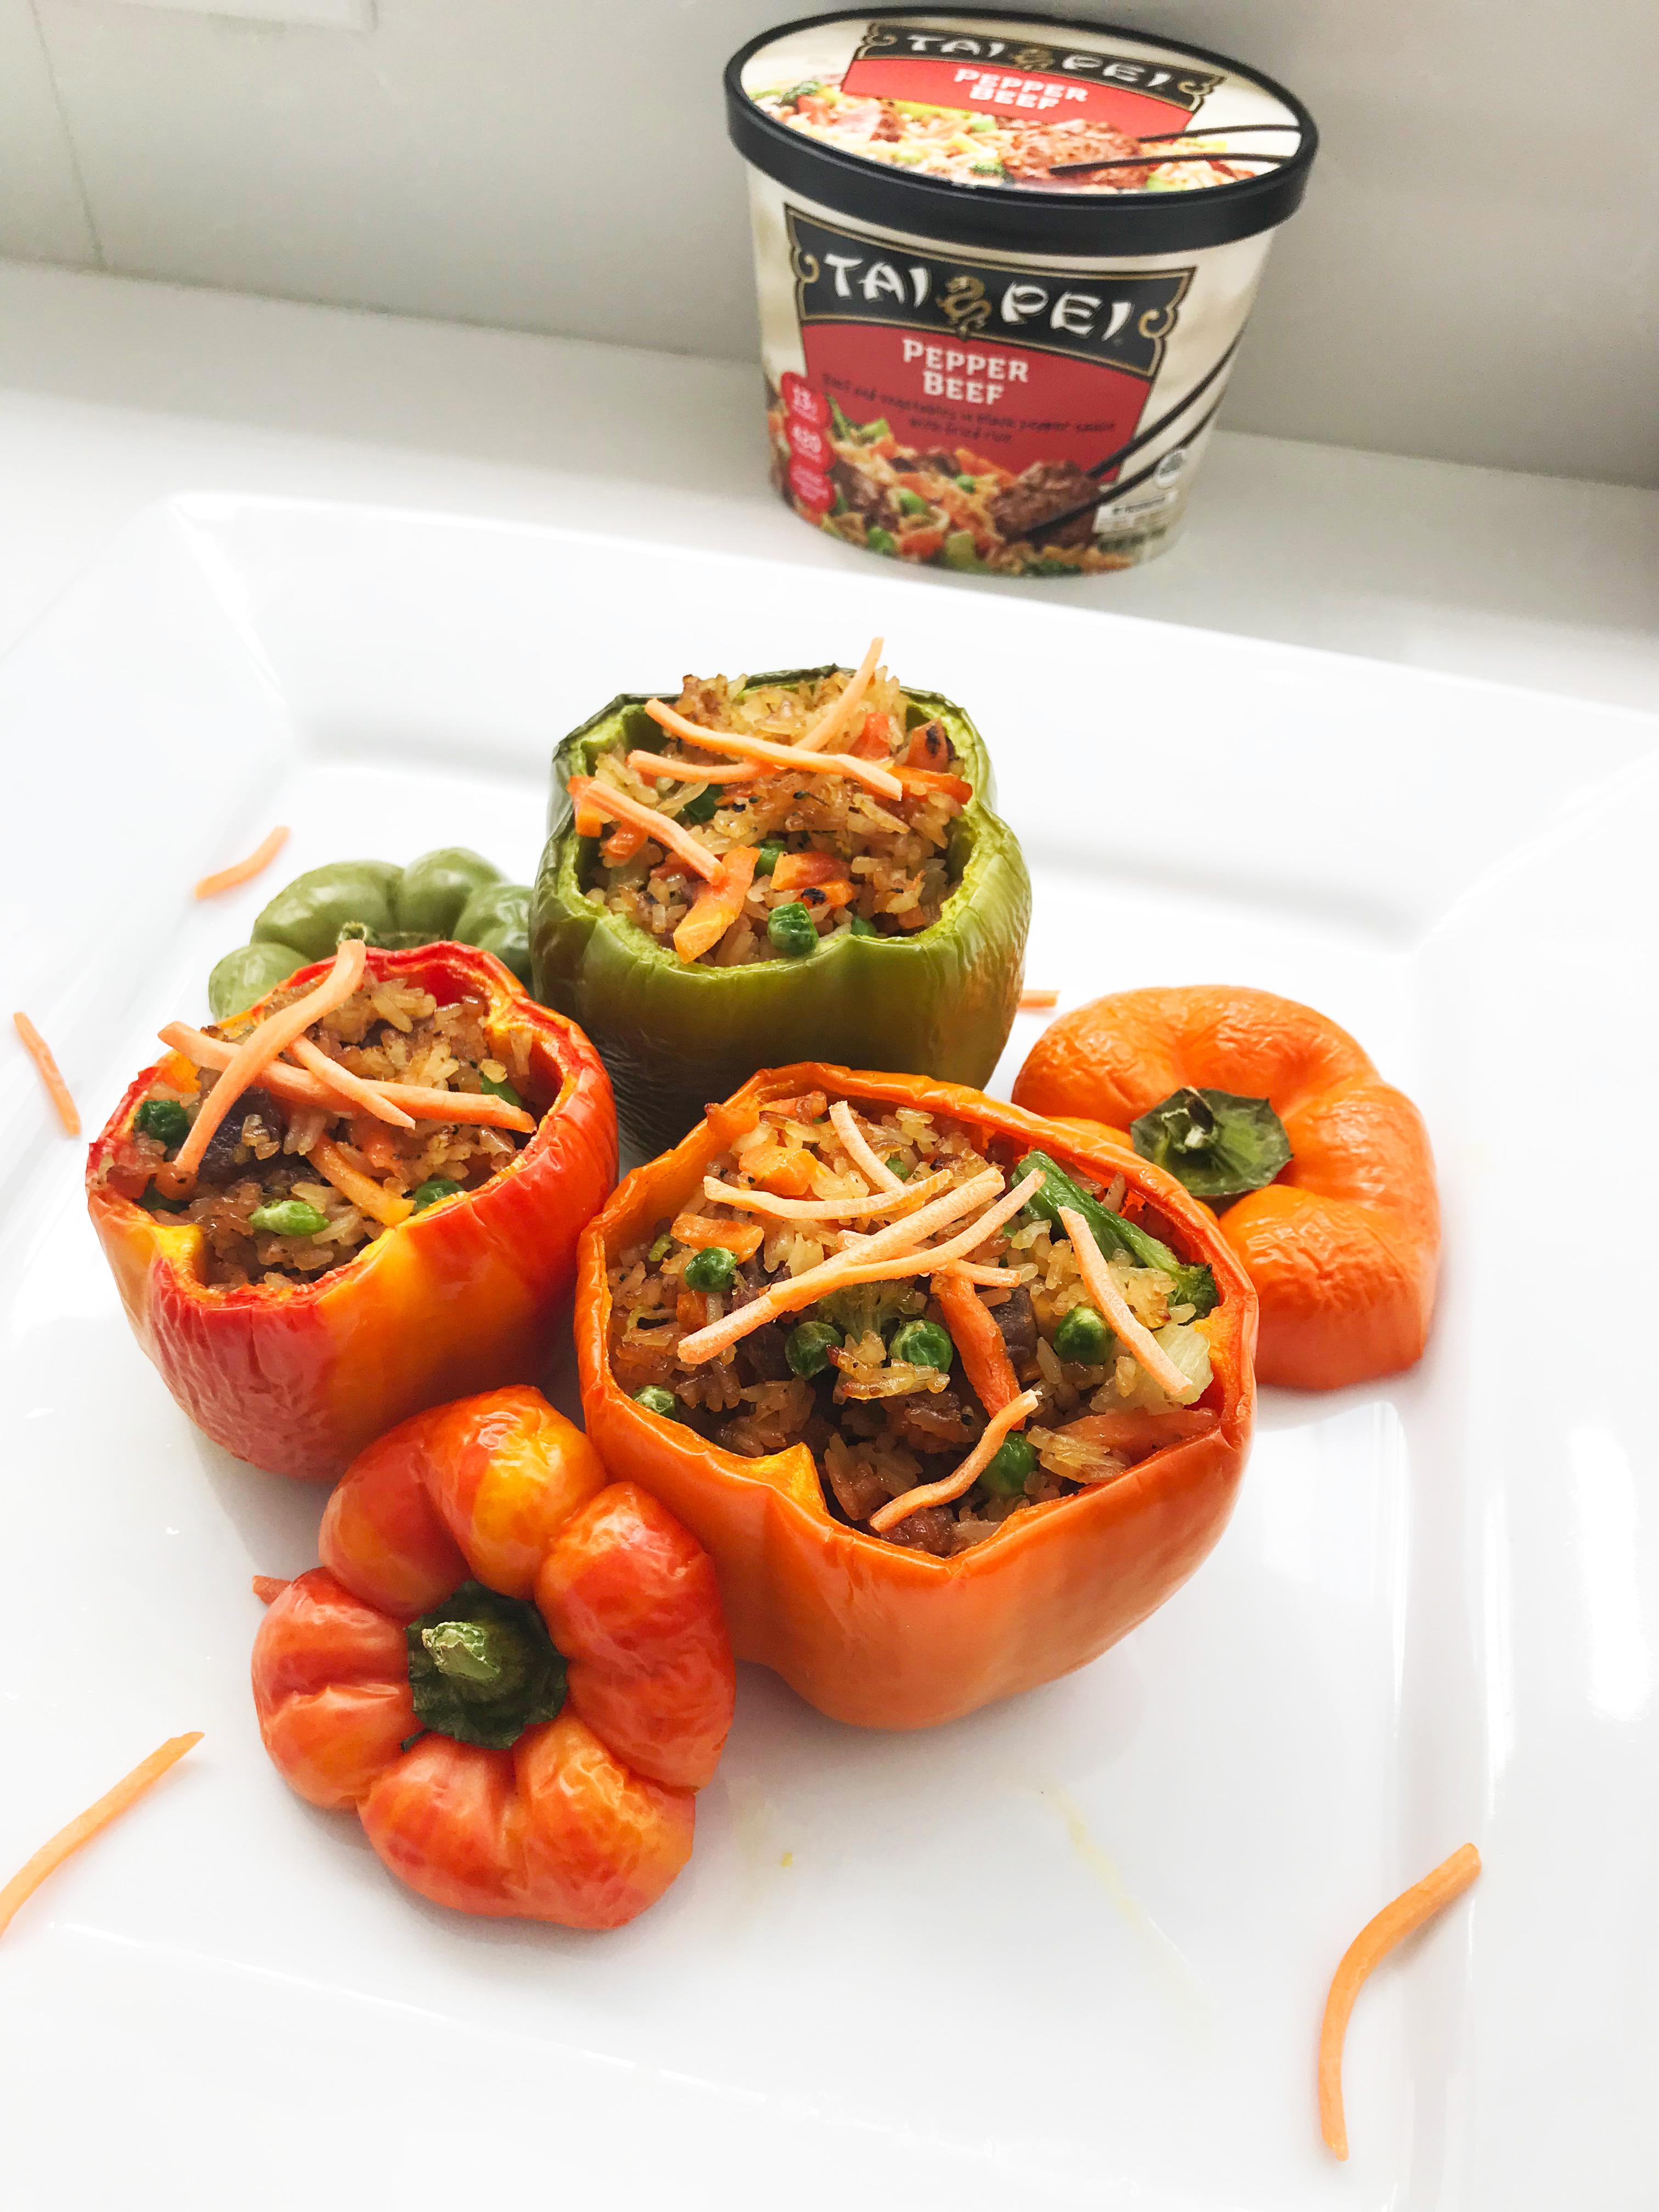 Tai Pei Food Stuffed Peppers